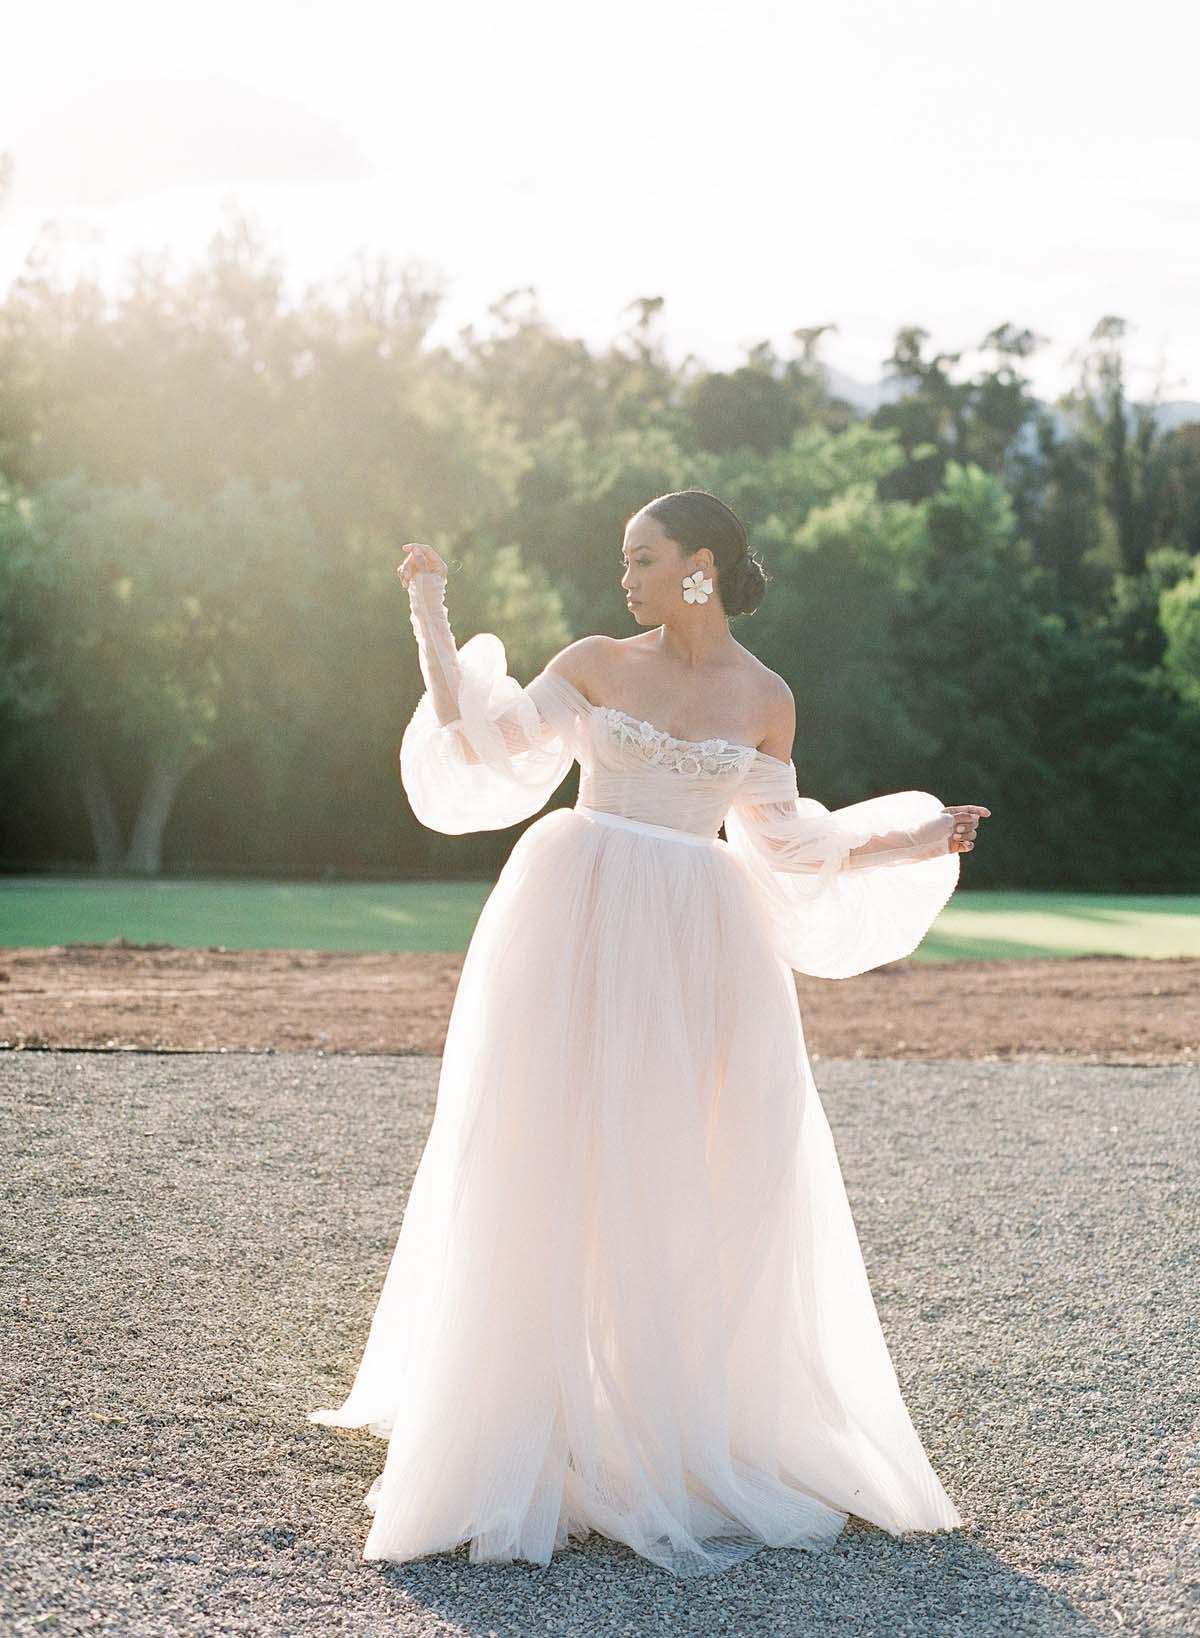 XOXO_BRIDE_Events-Michelle-Beller_Photography_0141